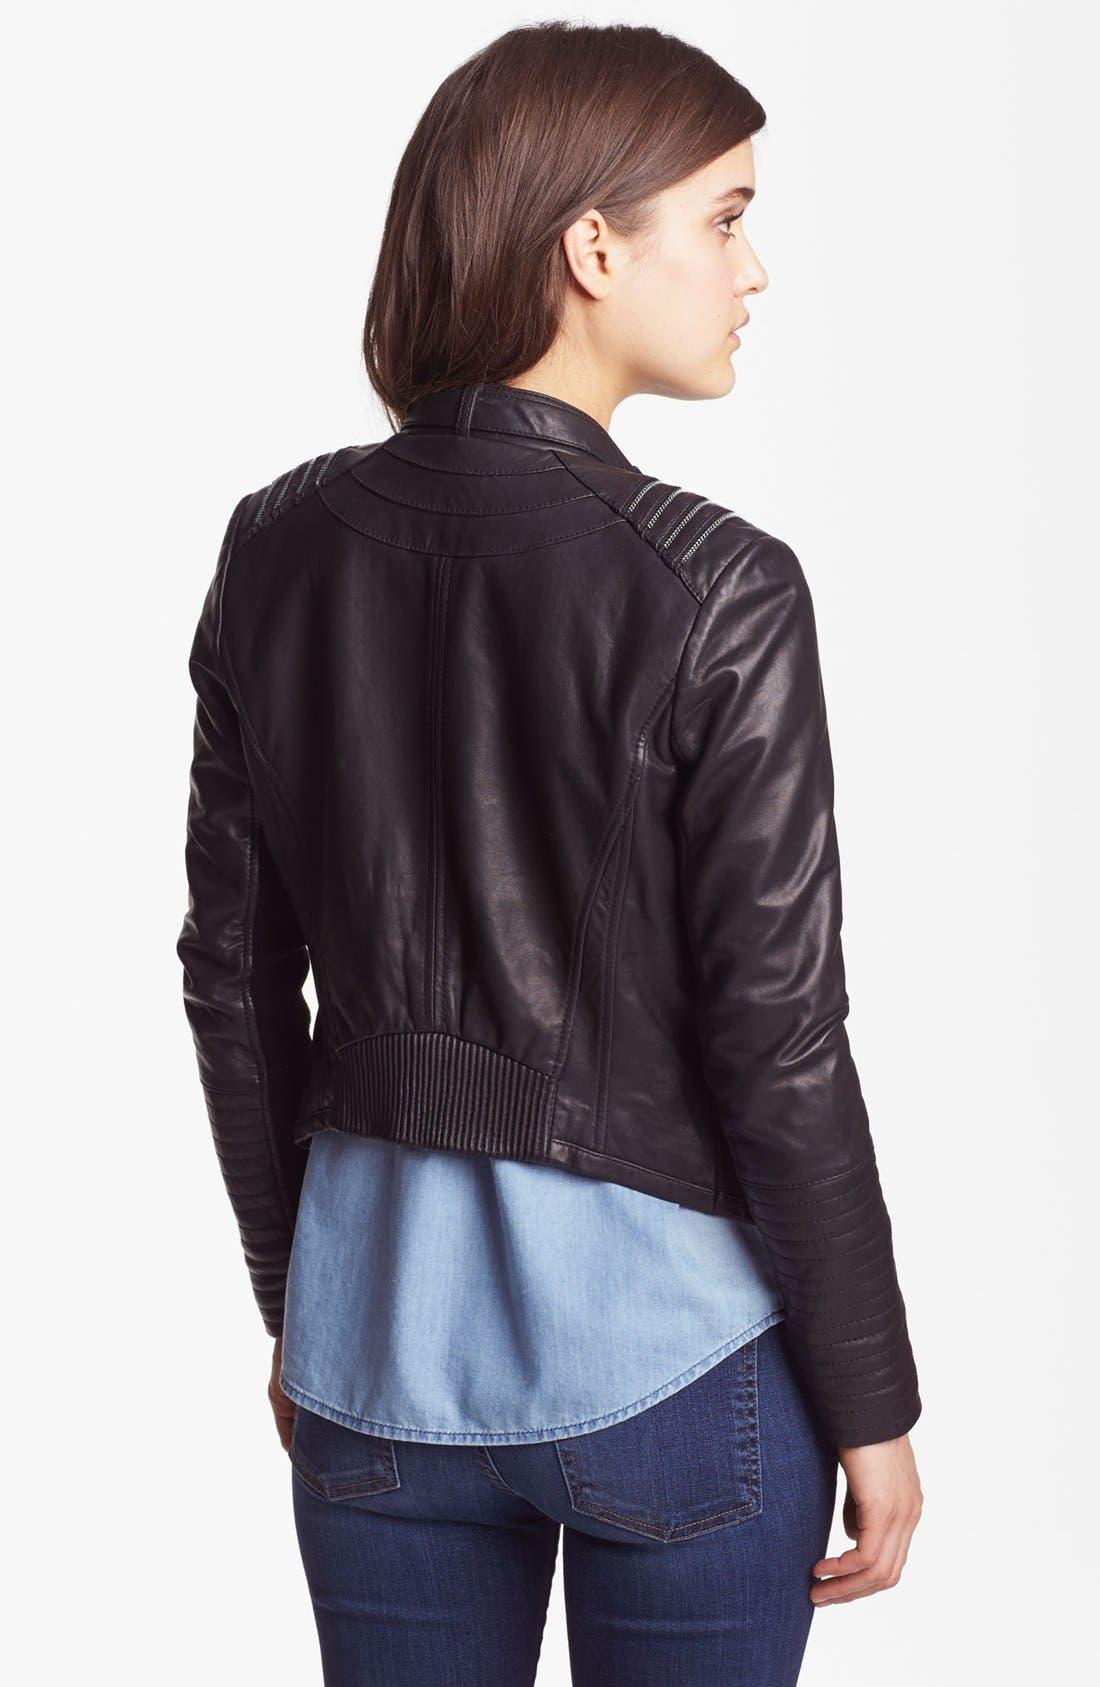 BERNARDO, Asymmetrical Leather Moto Jacket, Alternate thumbnail 3, color, 001